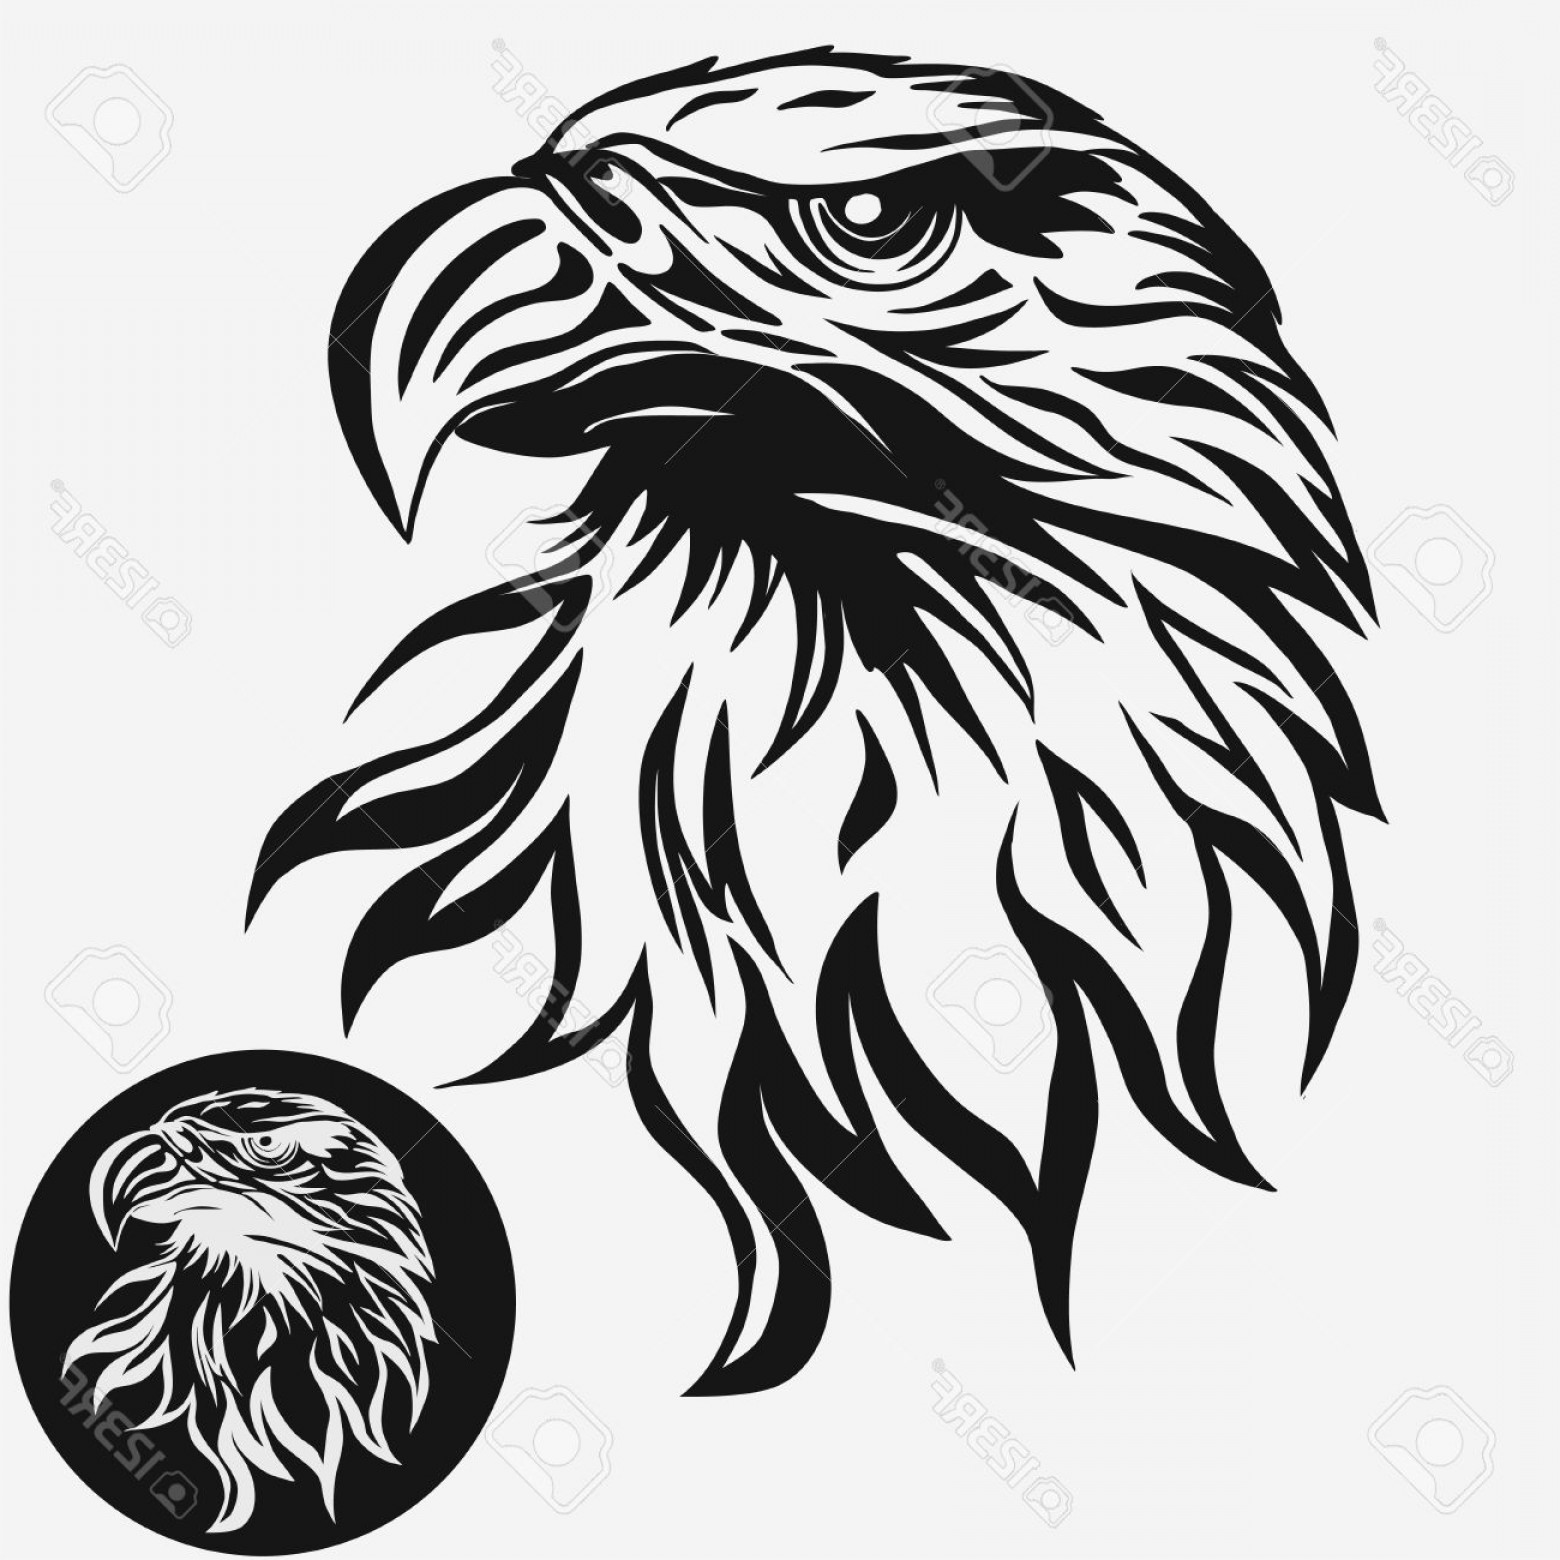 Hawk mascot clipart image black and white stock Photostock Vector Eagle Head Logo Template Hawk Mascot Graphic ... image black and white stock